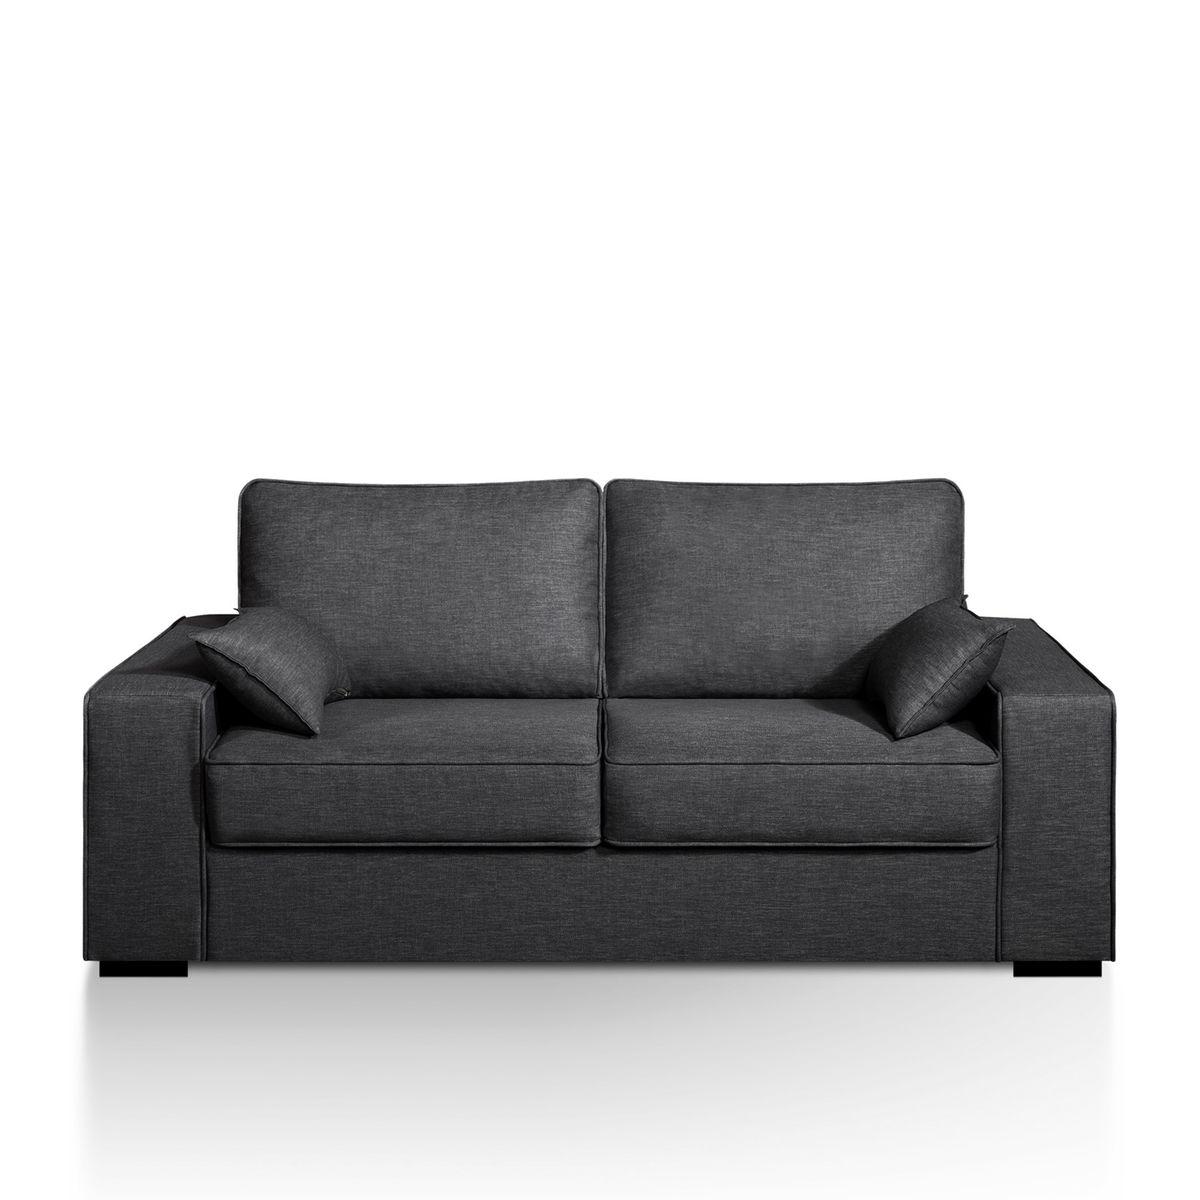 mecanisme de canape lit jusqu 40 soldes deuxi me d marque. Black Bedroom Furniture Sets. Home Design Ideas